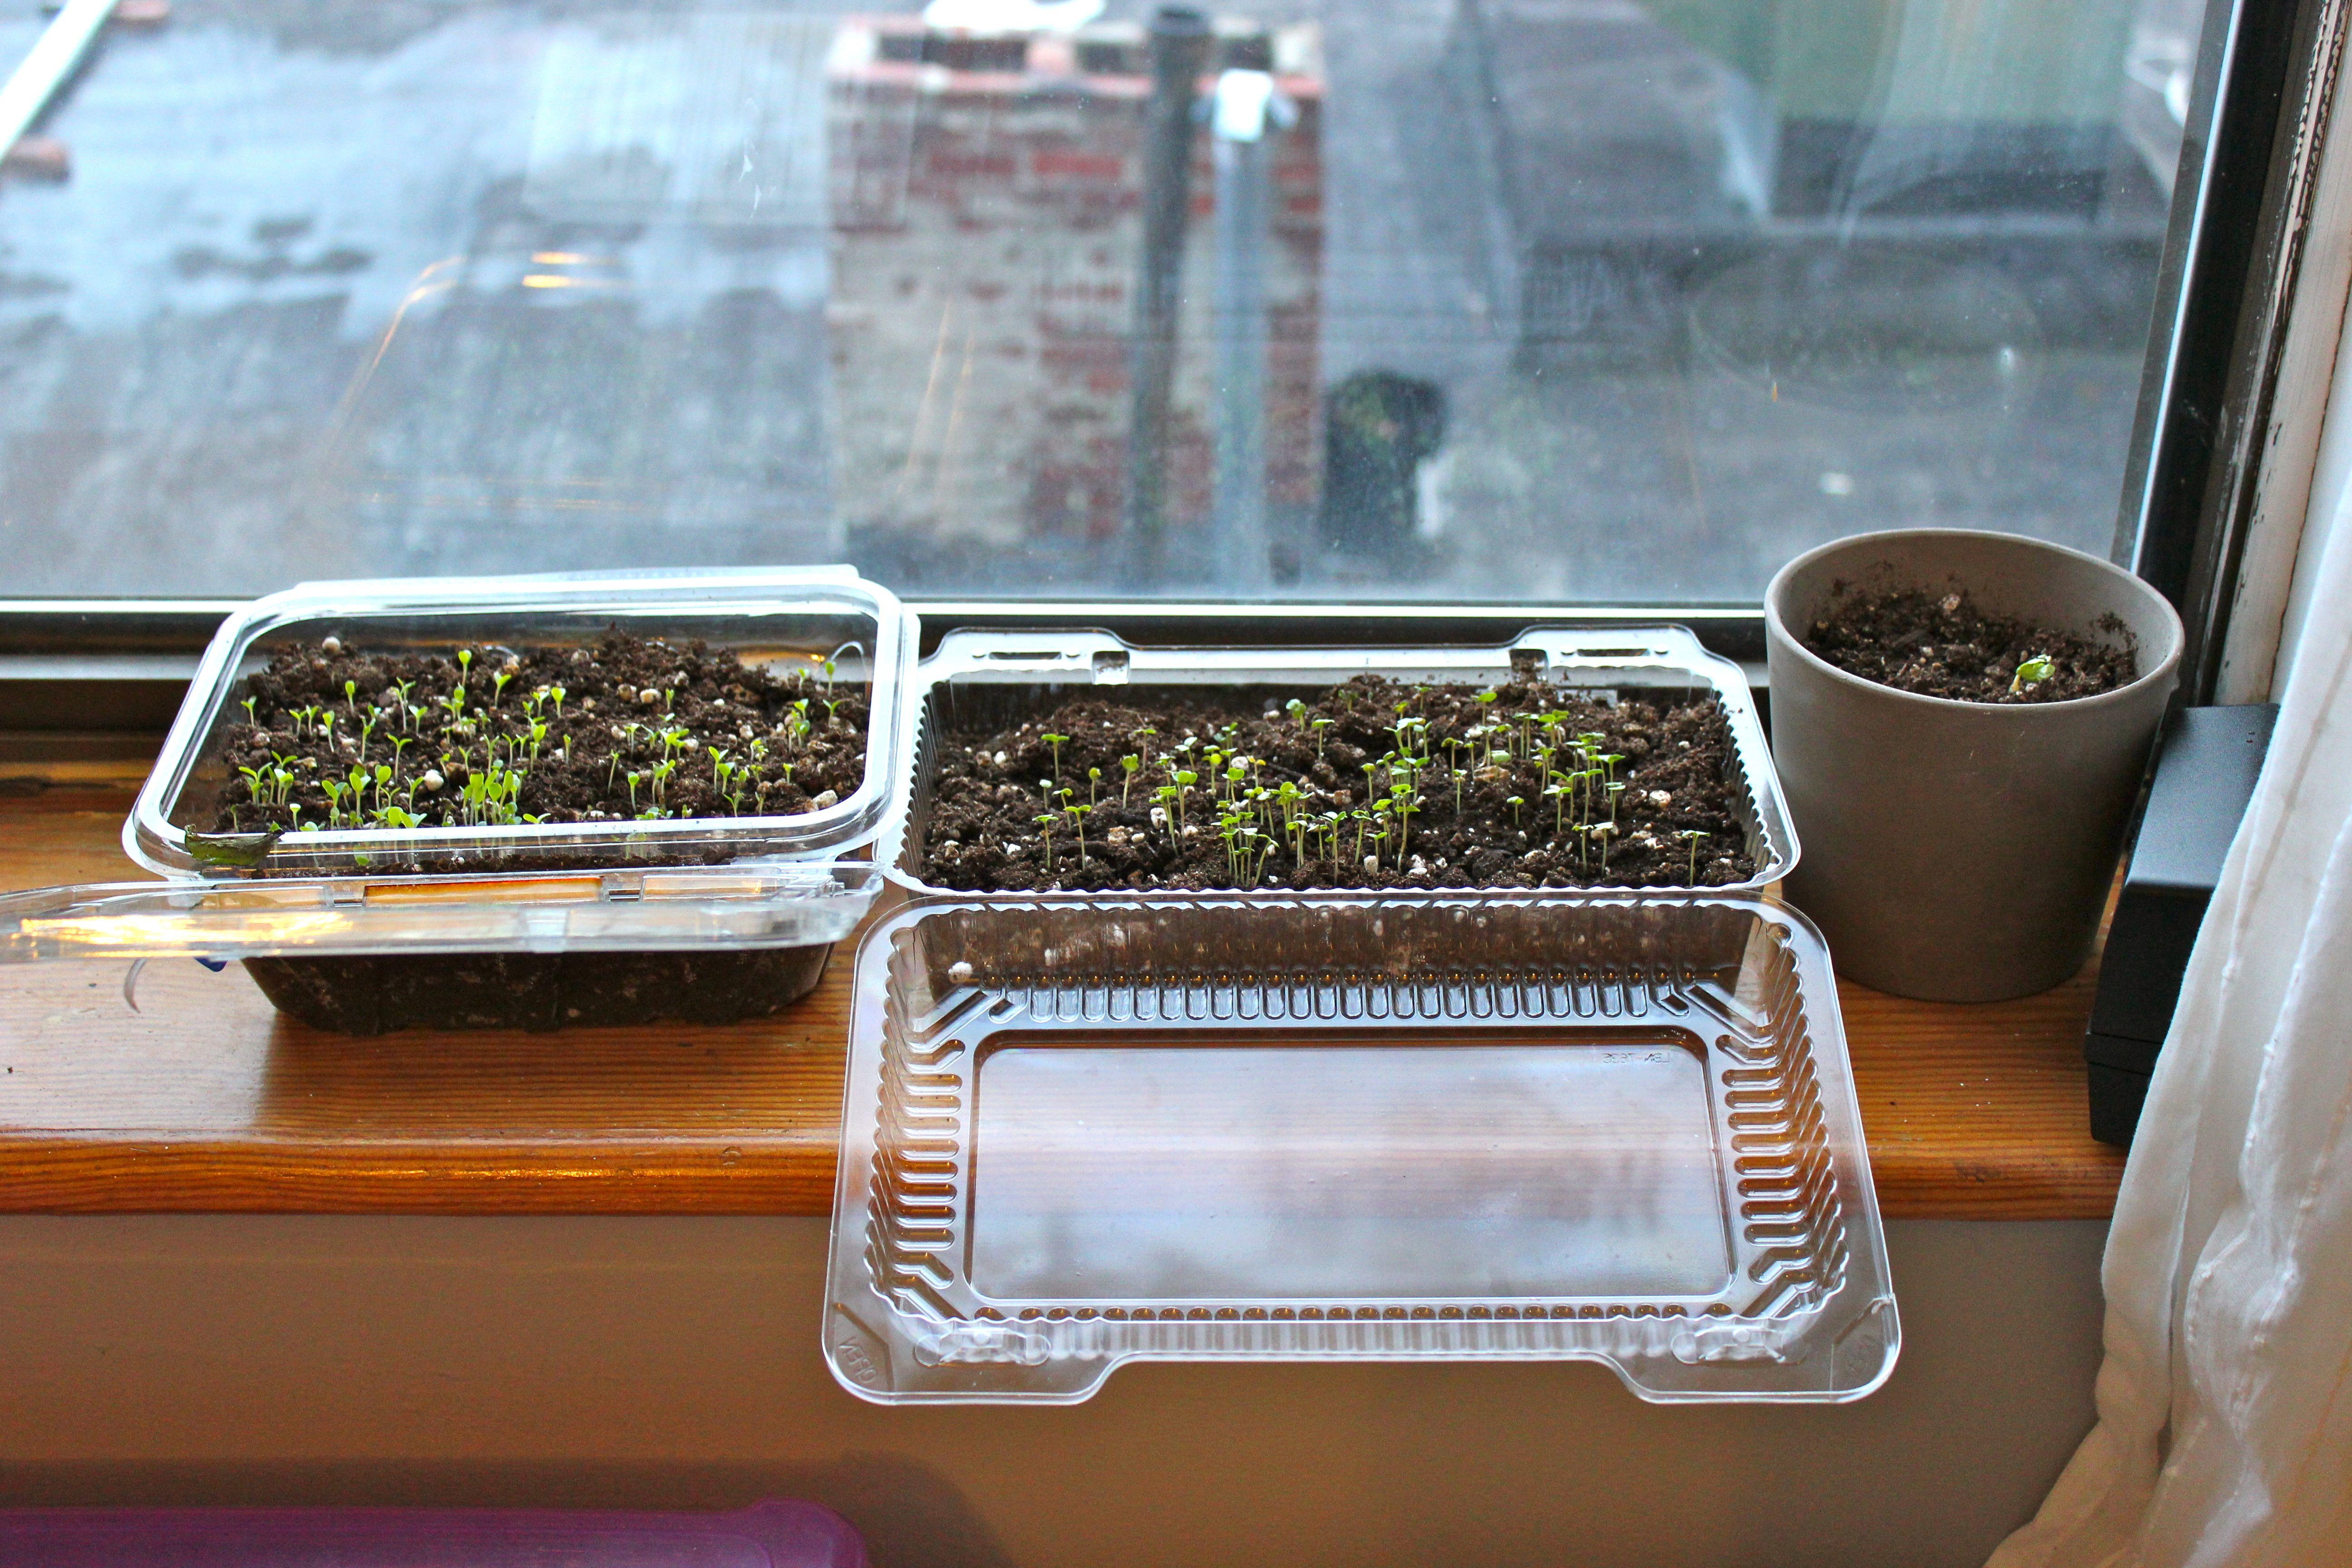 How To Grow Seeds Indoors Growing Seeds Survival Gardening Heirloom Vegetables